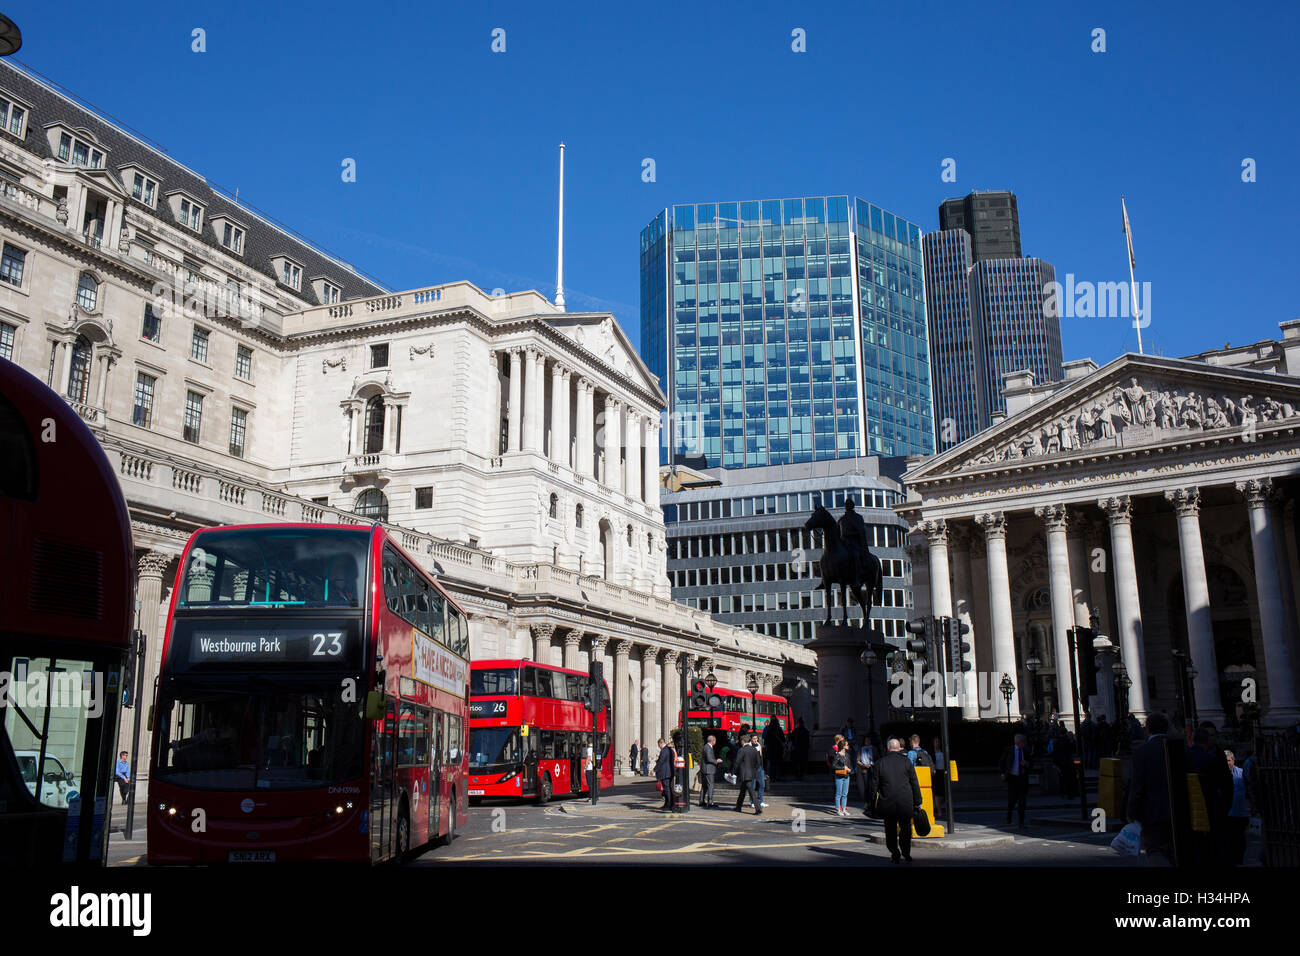 Bank of England, Threadneedle Street, London Exterior view - Stock Image